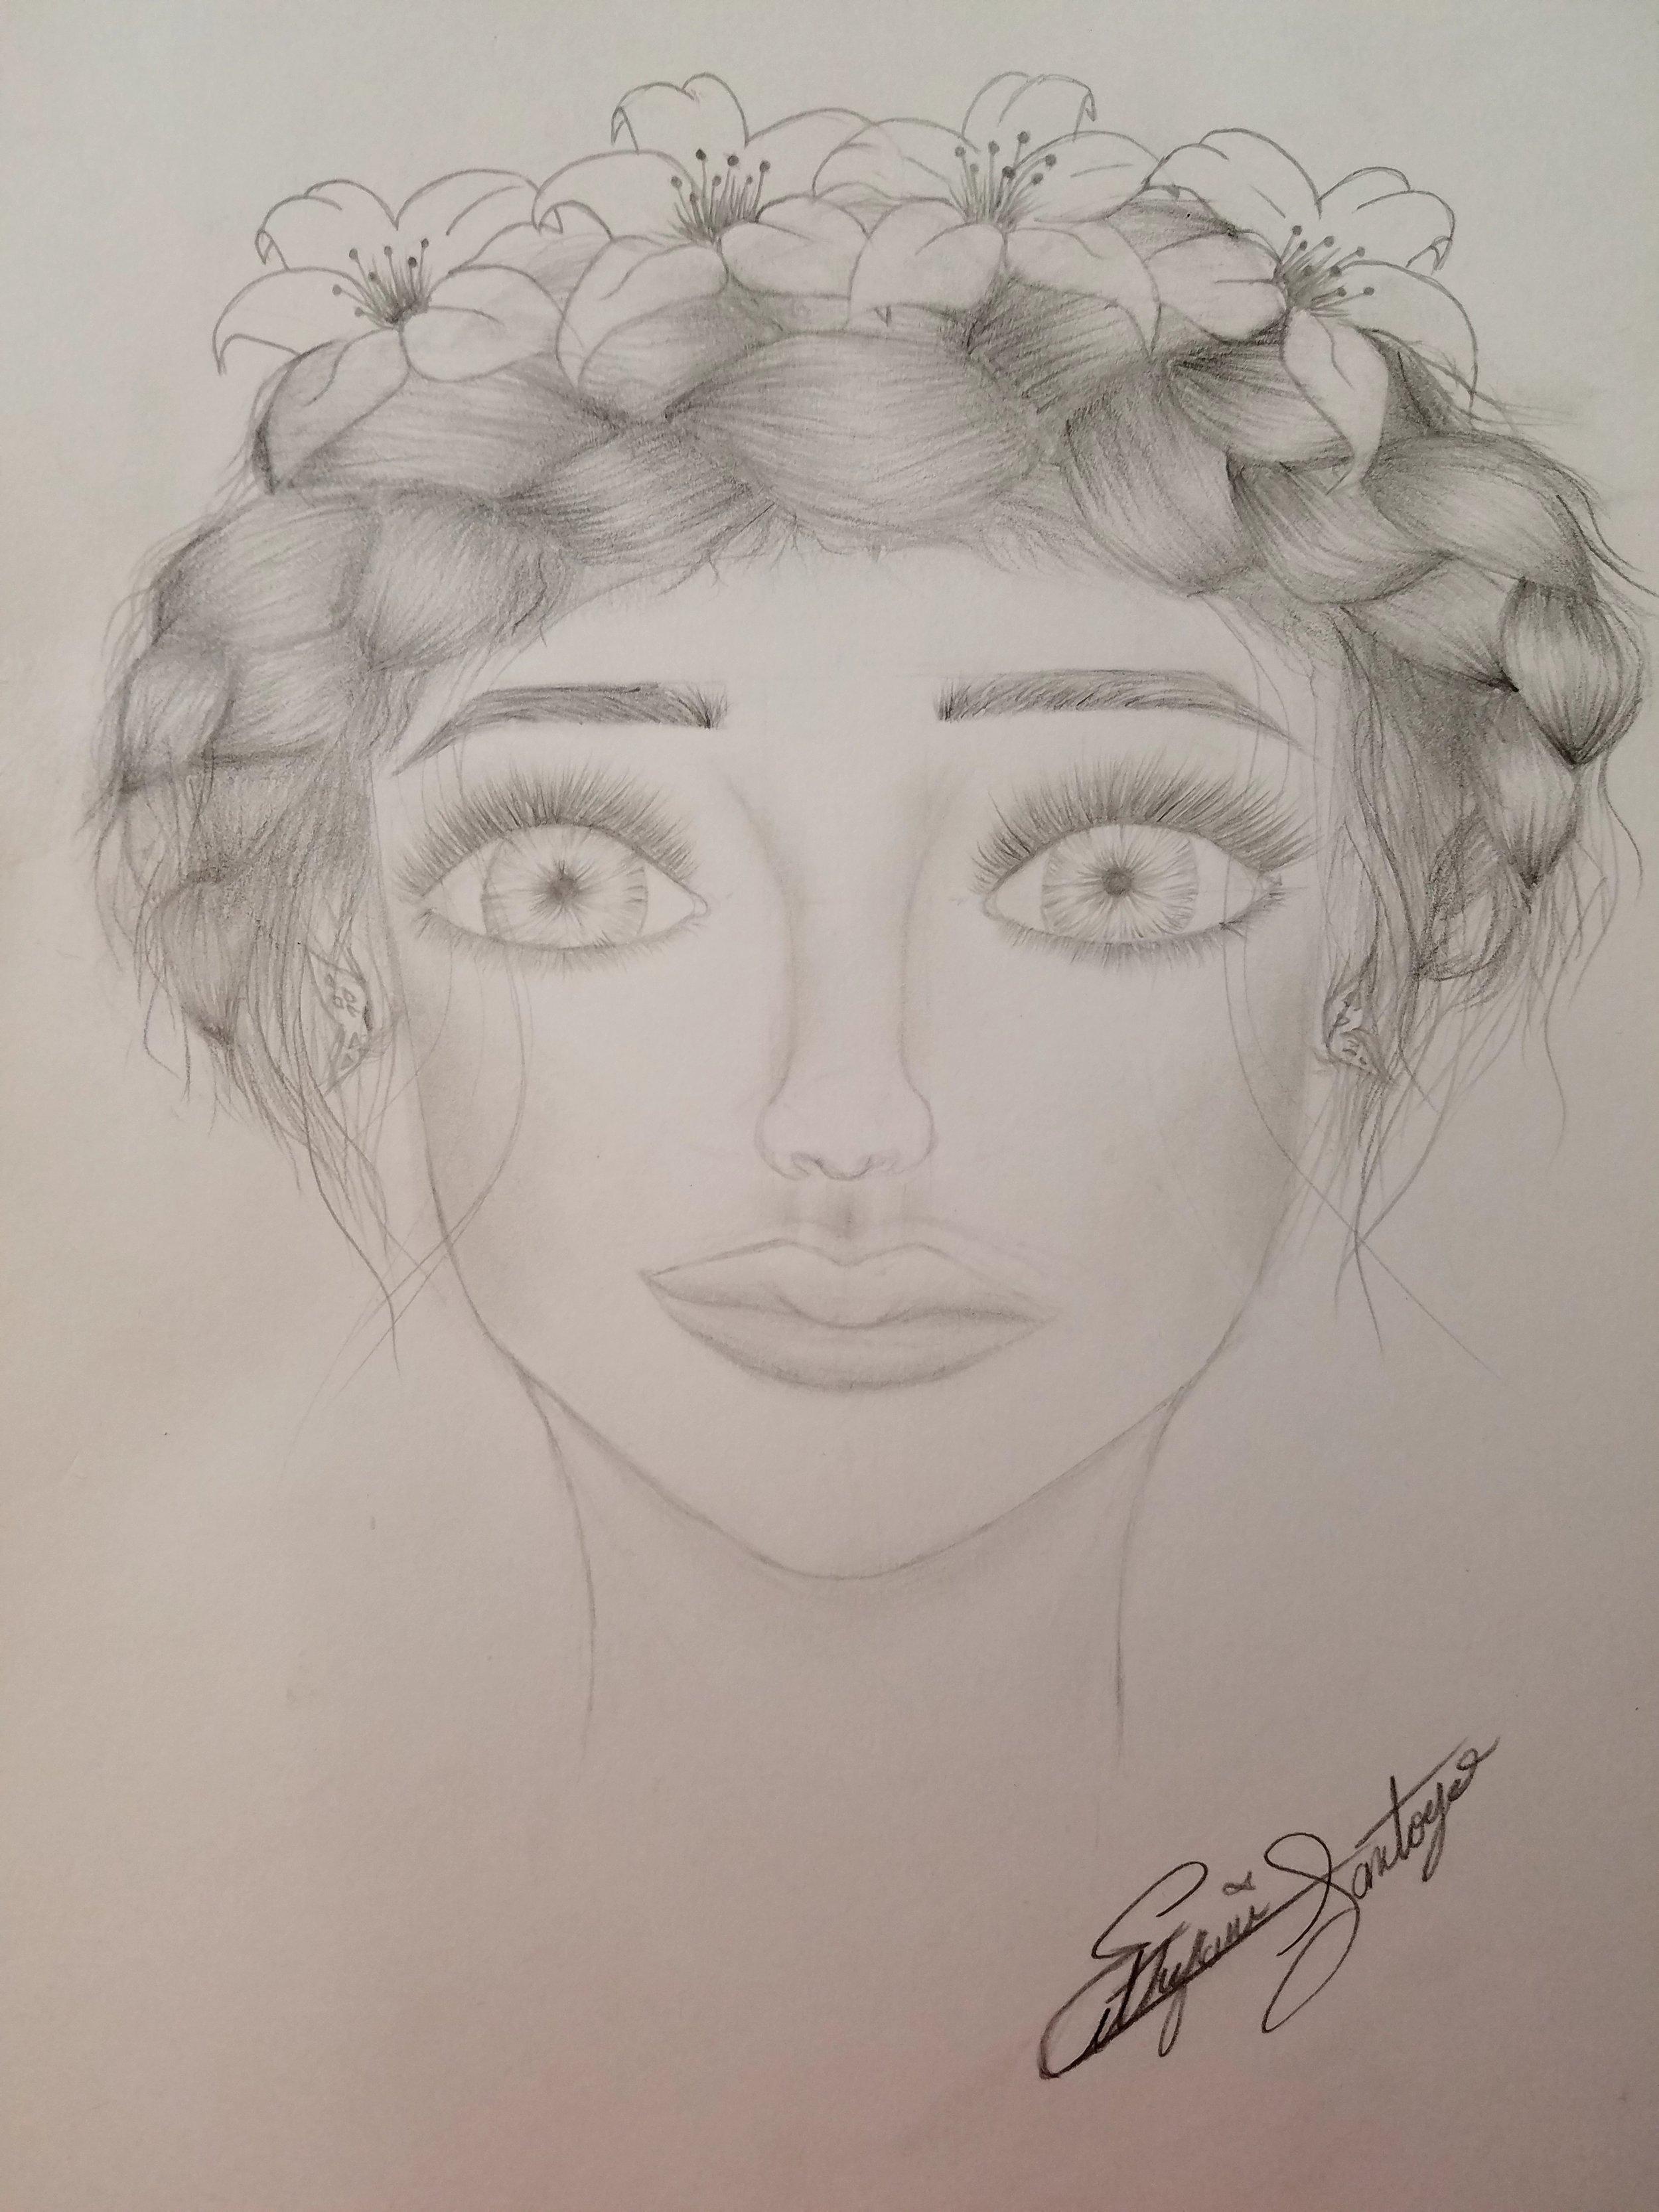 By Esthéfani Santoyo-Saldaña